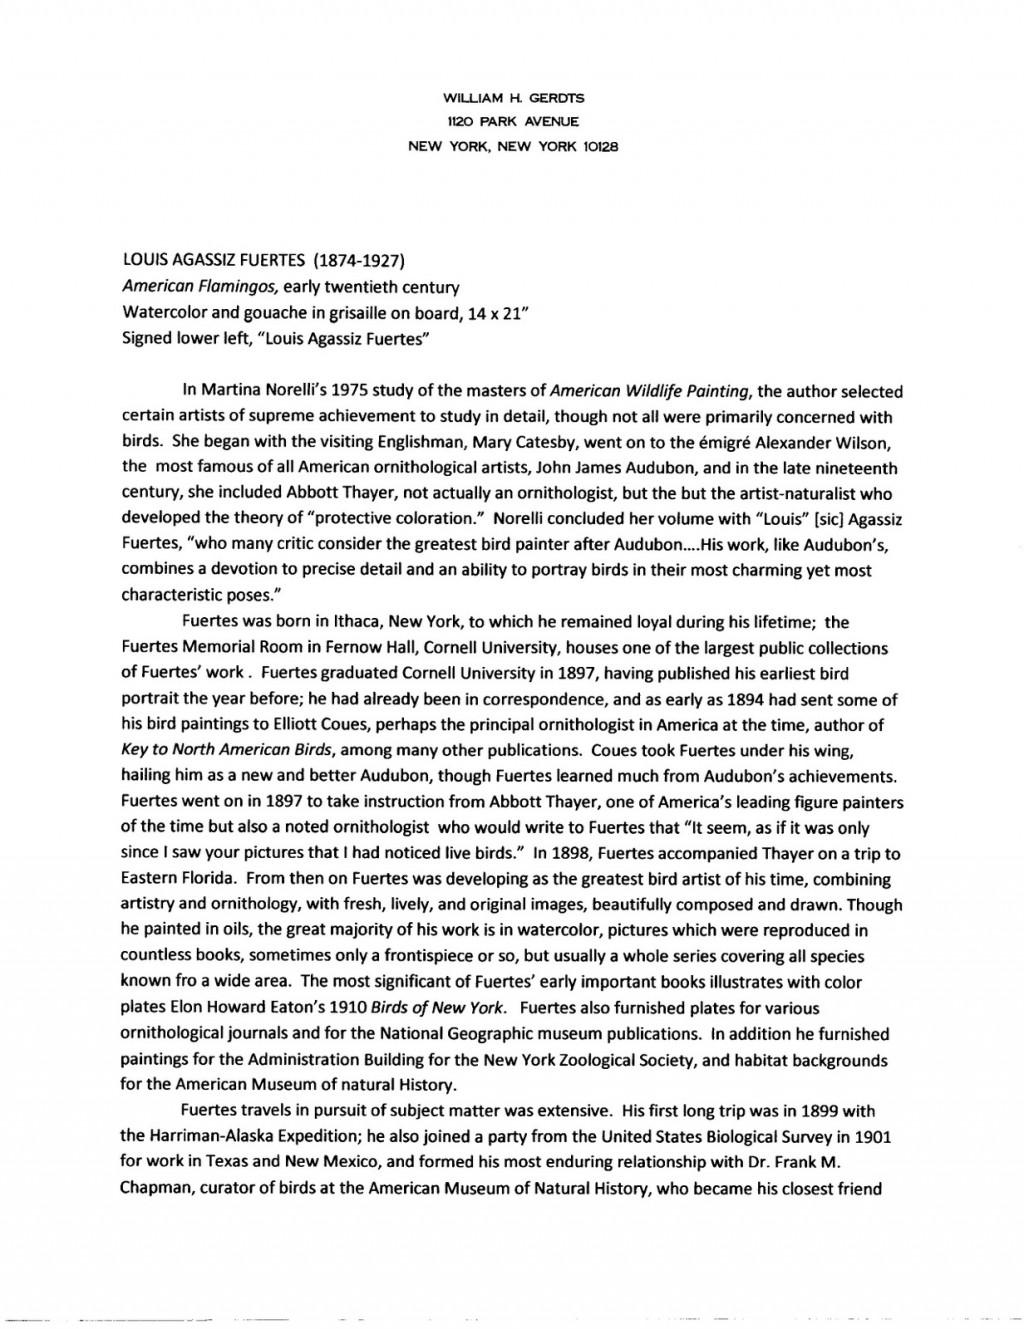 001 Fuertes20american20flamingos20001 Essay Example Grad Stupendous School Tips Graduate Speech Pathology Admission Format Large